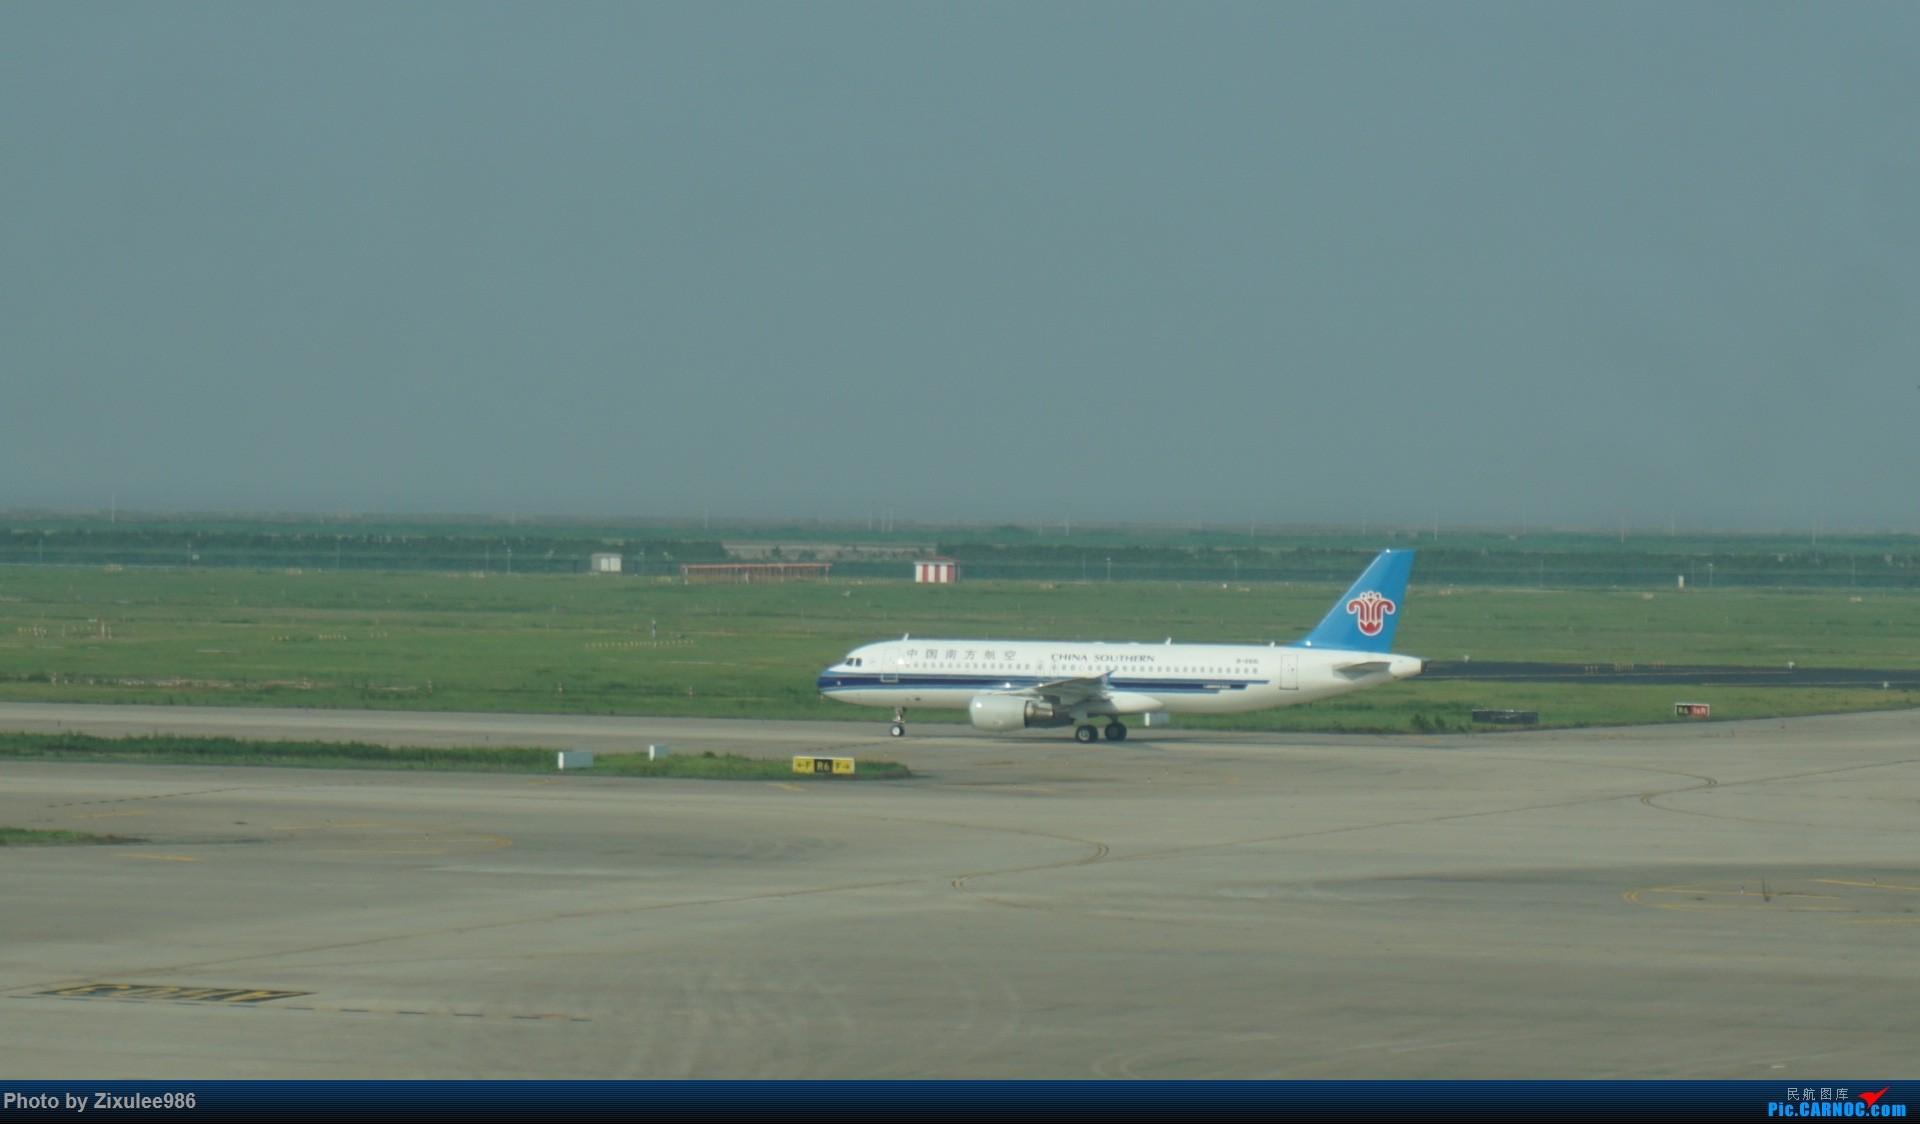 Re:[原创]加拿大21日游学之旅(一)~JJN-PVG-YYZ..(内含flightlog)~第一次发游记~多图缓更请谅解 AIRBUS A320-200 B-6681 中国上海浦东国际机场